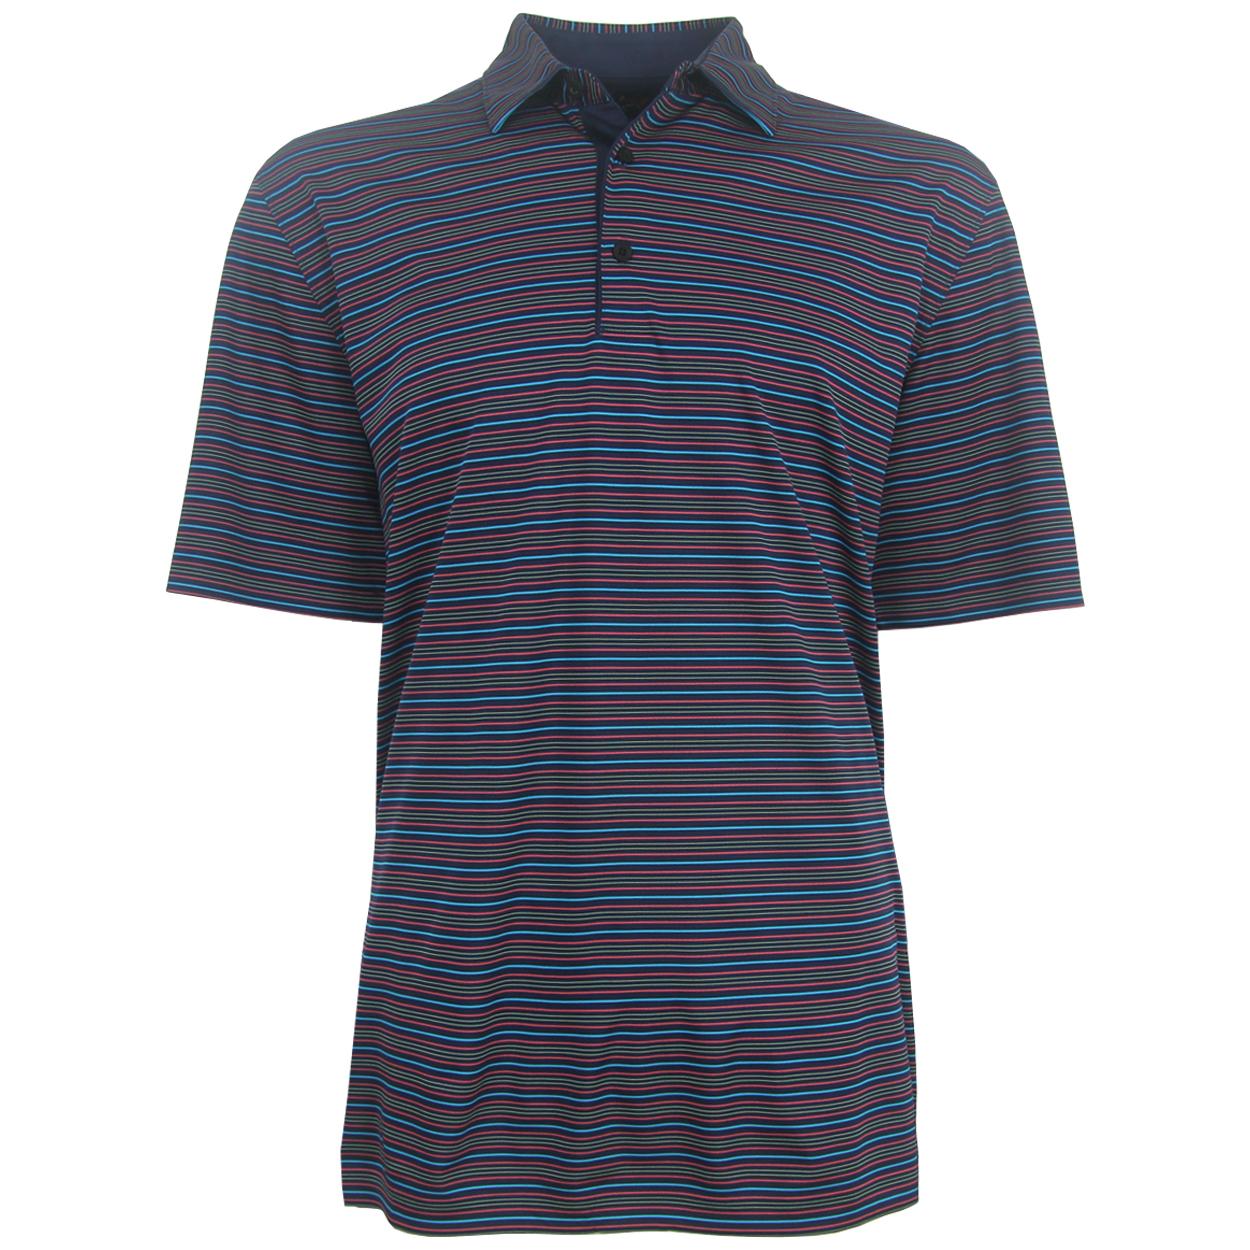 Greg norman men 39 s ml75 multi striped polo golf shirt for Greg norman ml75 shirts